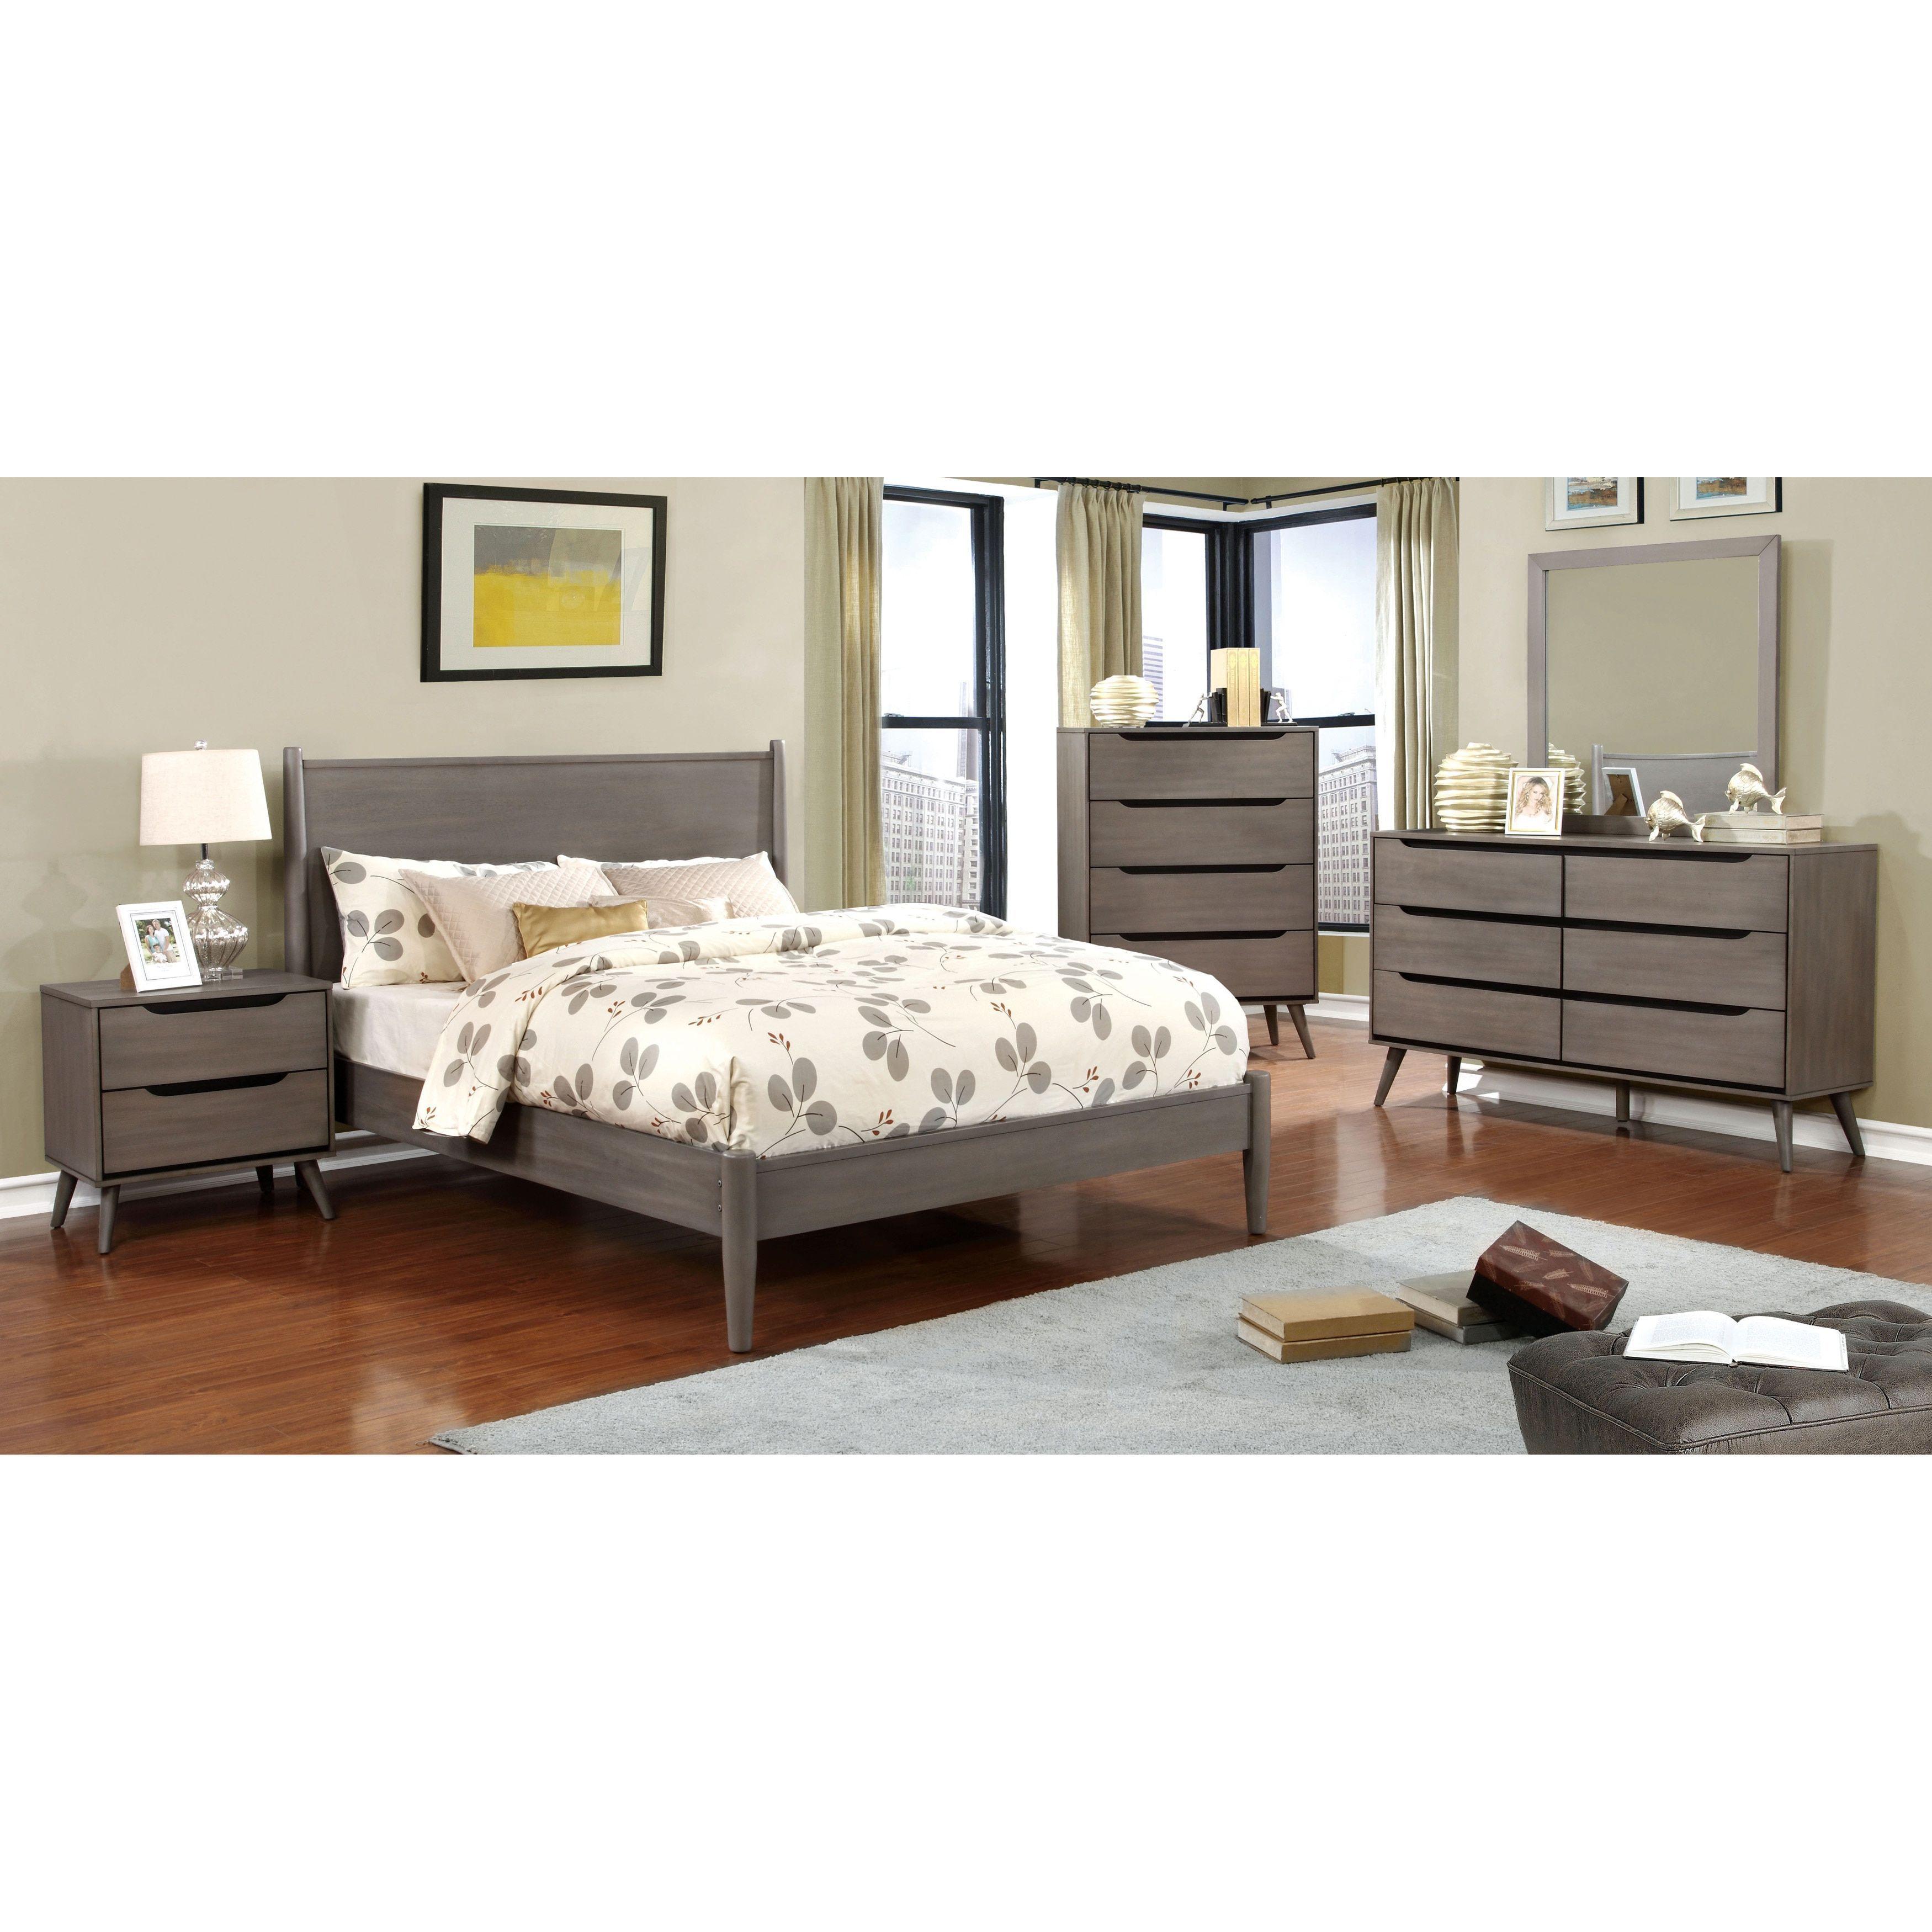 Furniture of America Corrine Mid Century Modern King size Platform